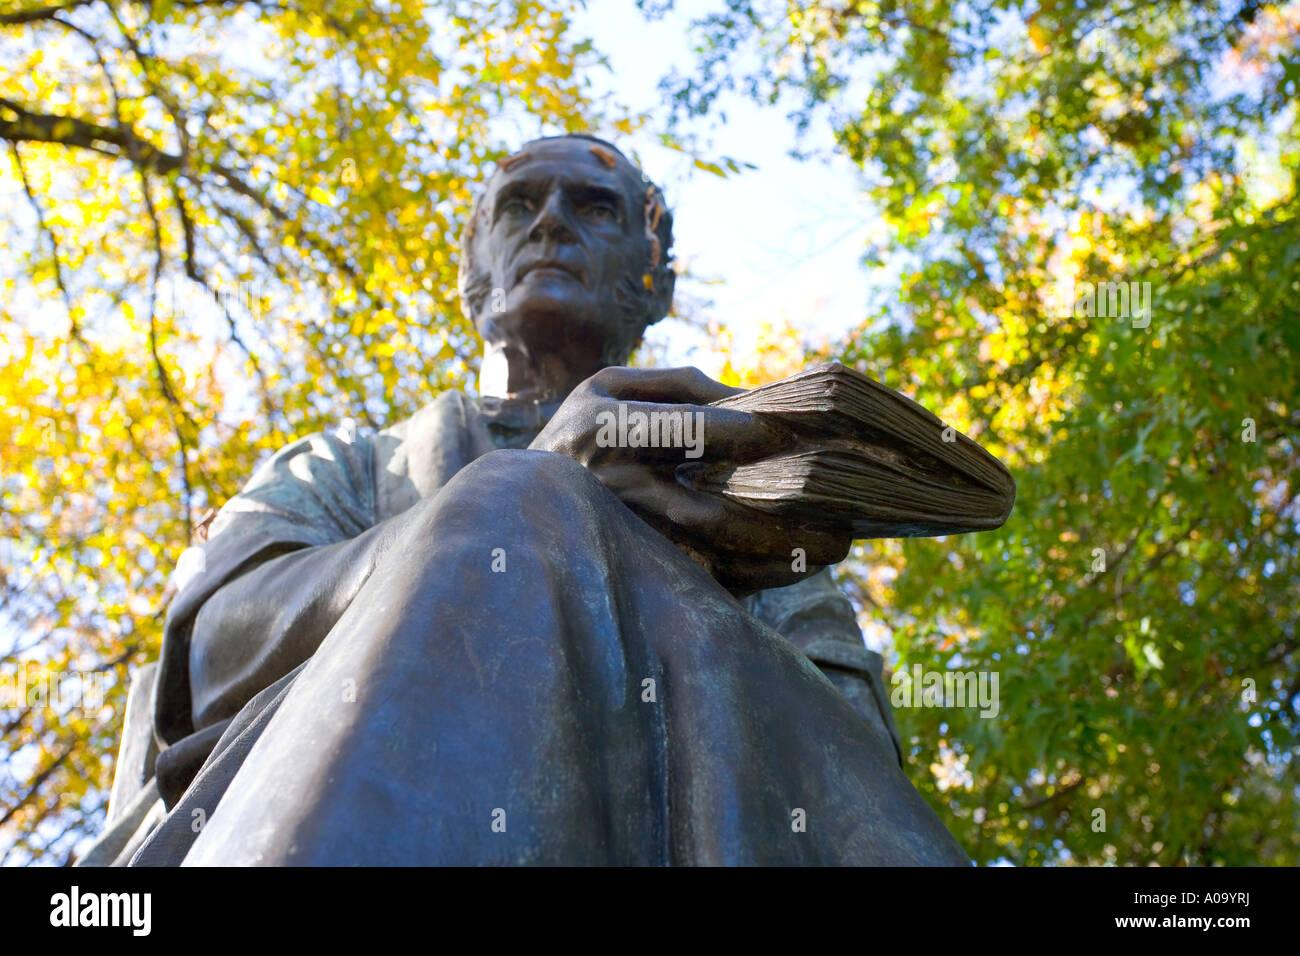 Universidad de Yale Theodore Dwight Woolsey estatua en campus viejo de New Haven, Connecticut, EE.UU. Imagen De Stock